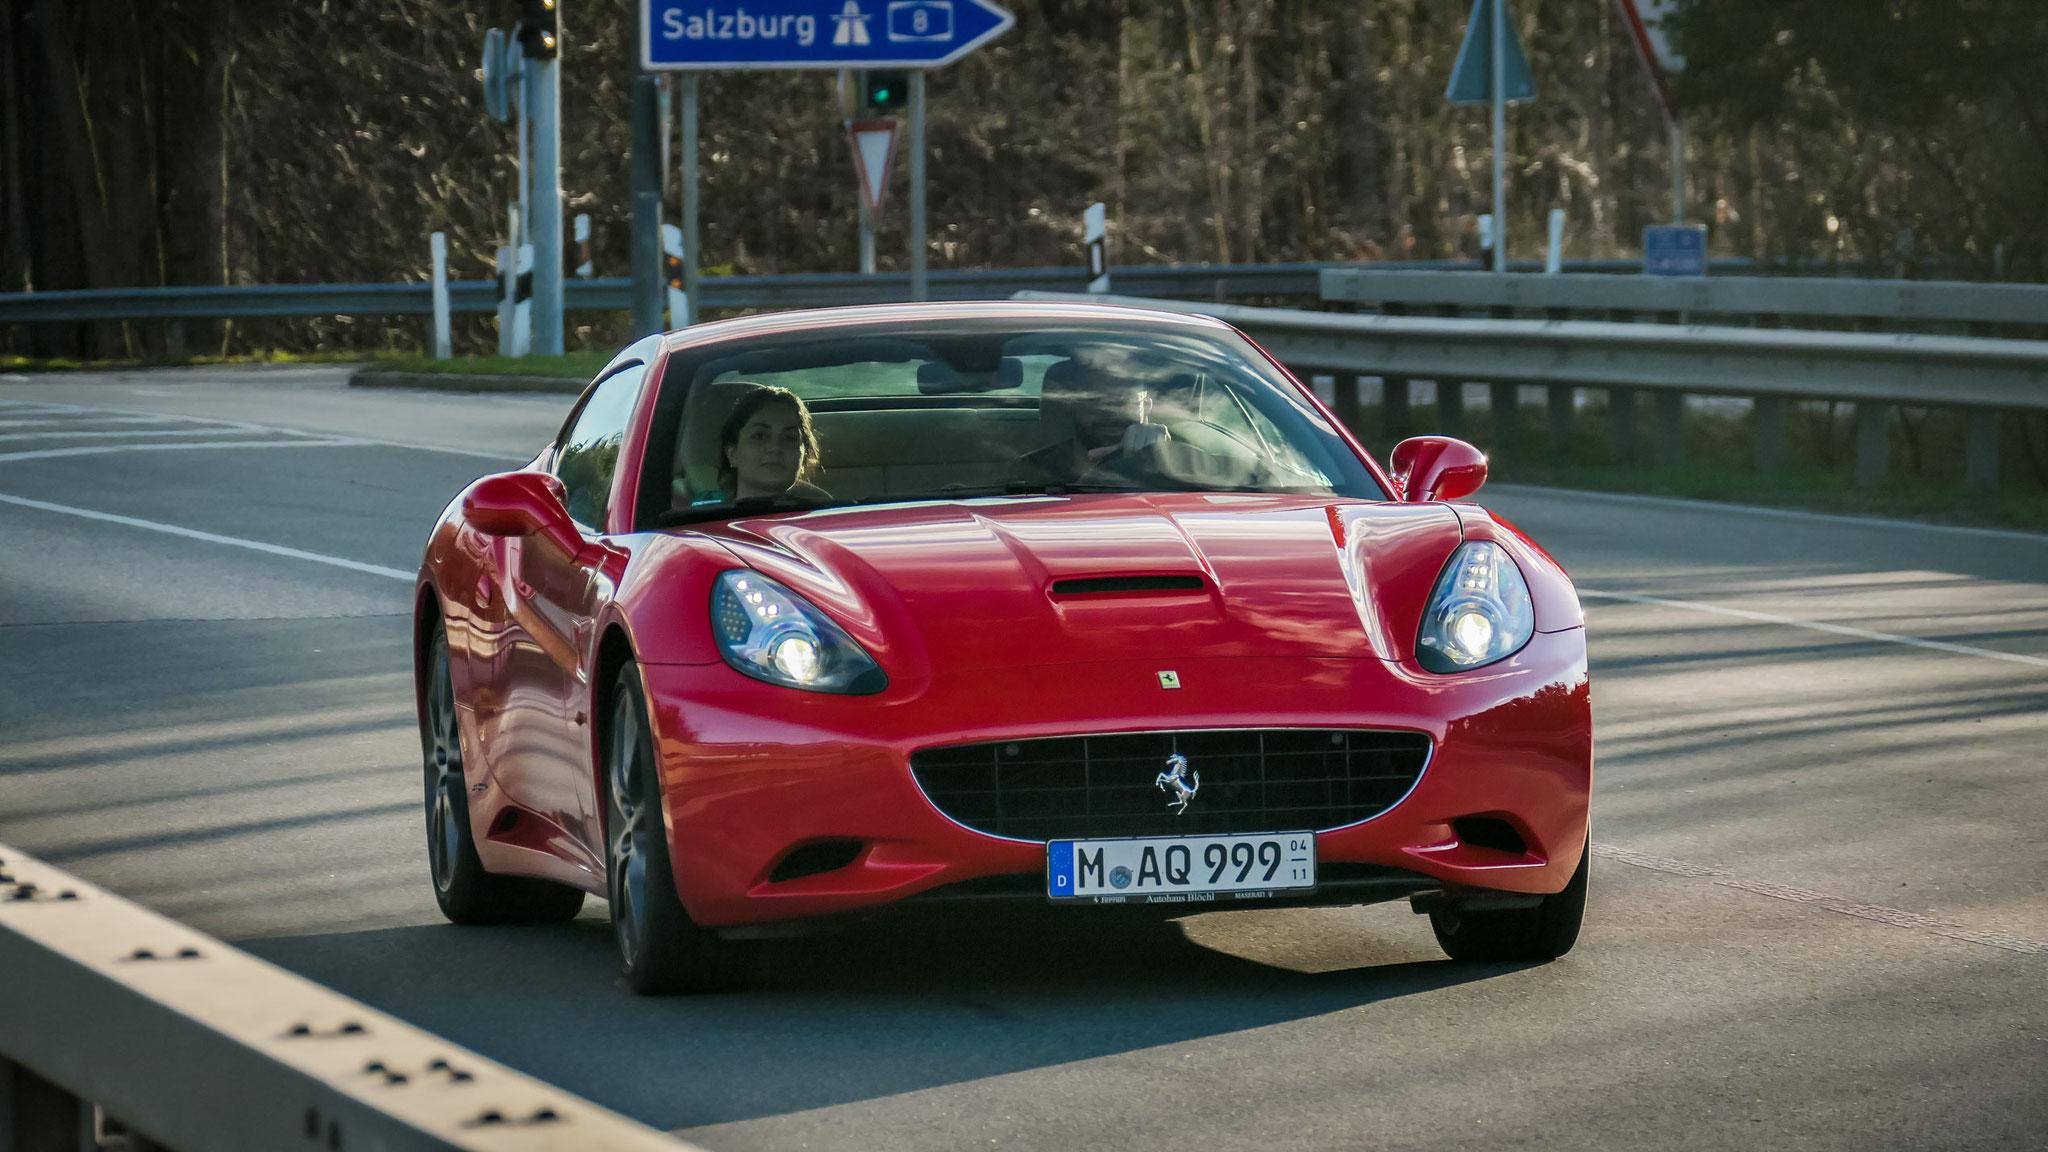 Ferrari California - M-AQ-999